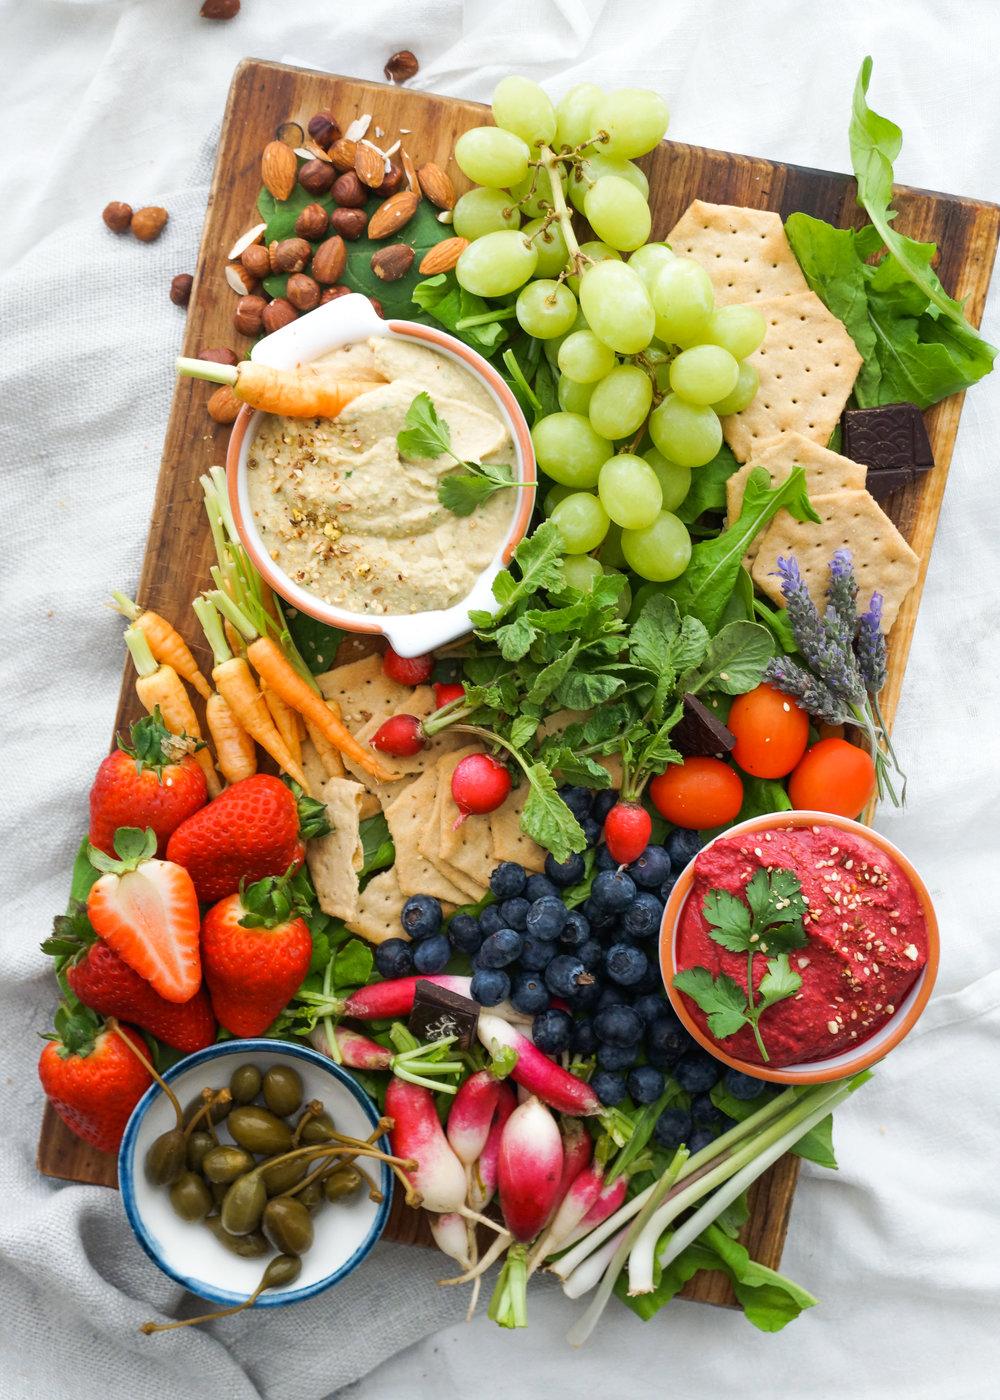 Vegan hummus platter